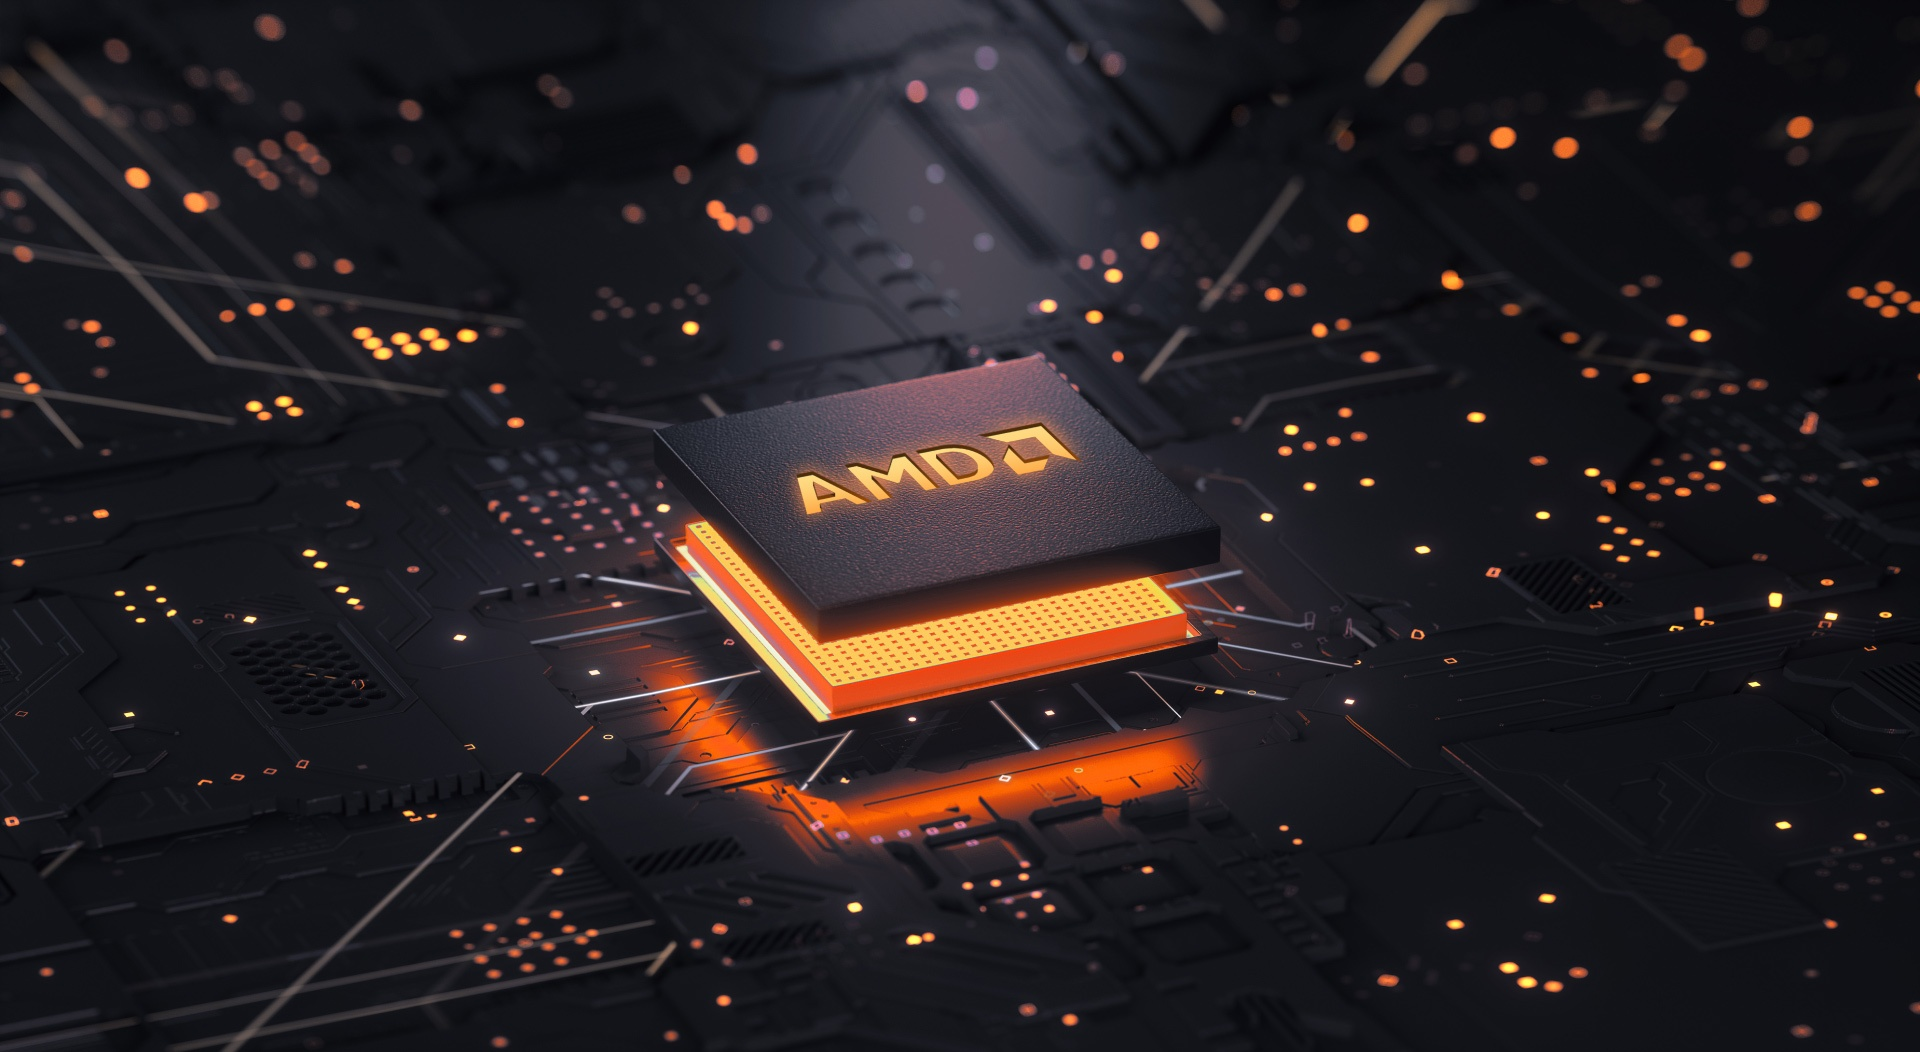 Amd Ryzen 3000 Boost Fix 1usmus Vs Official Amd Fix Hardware Times